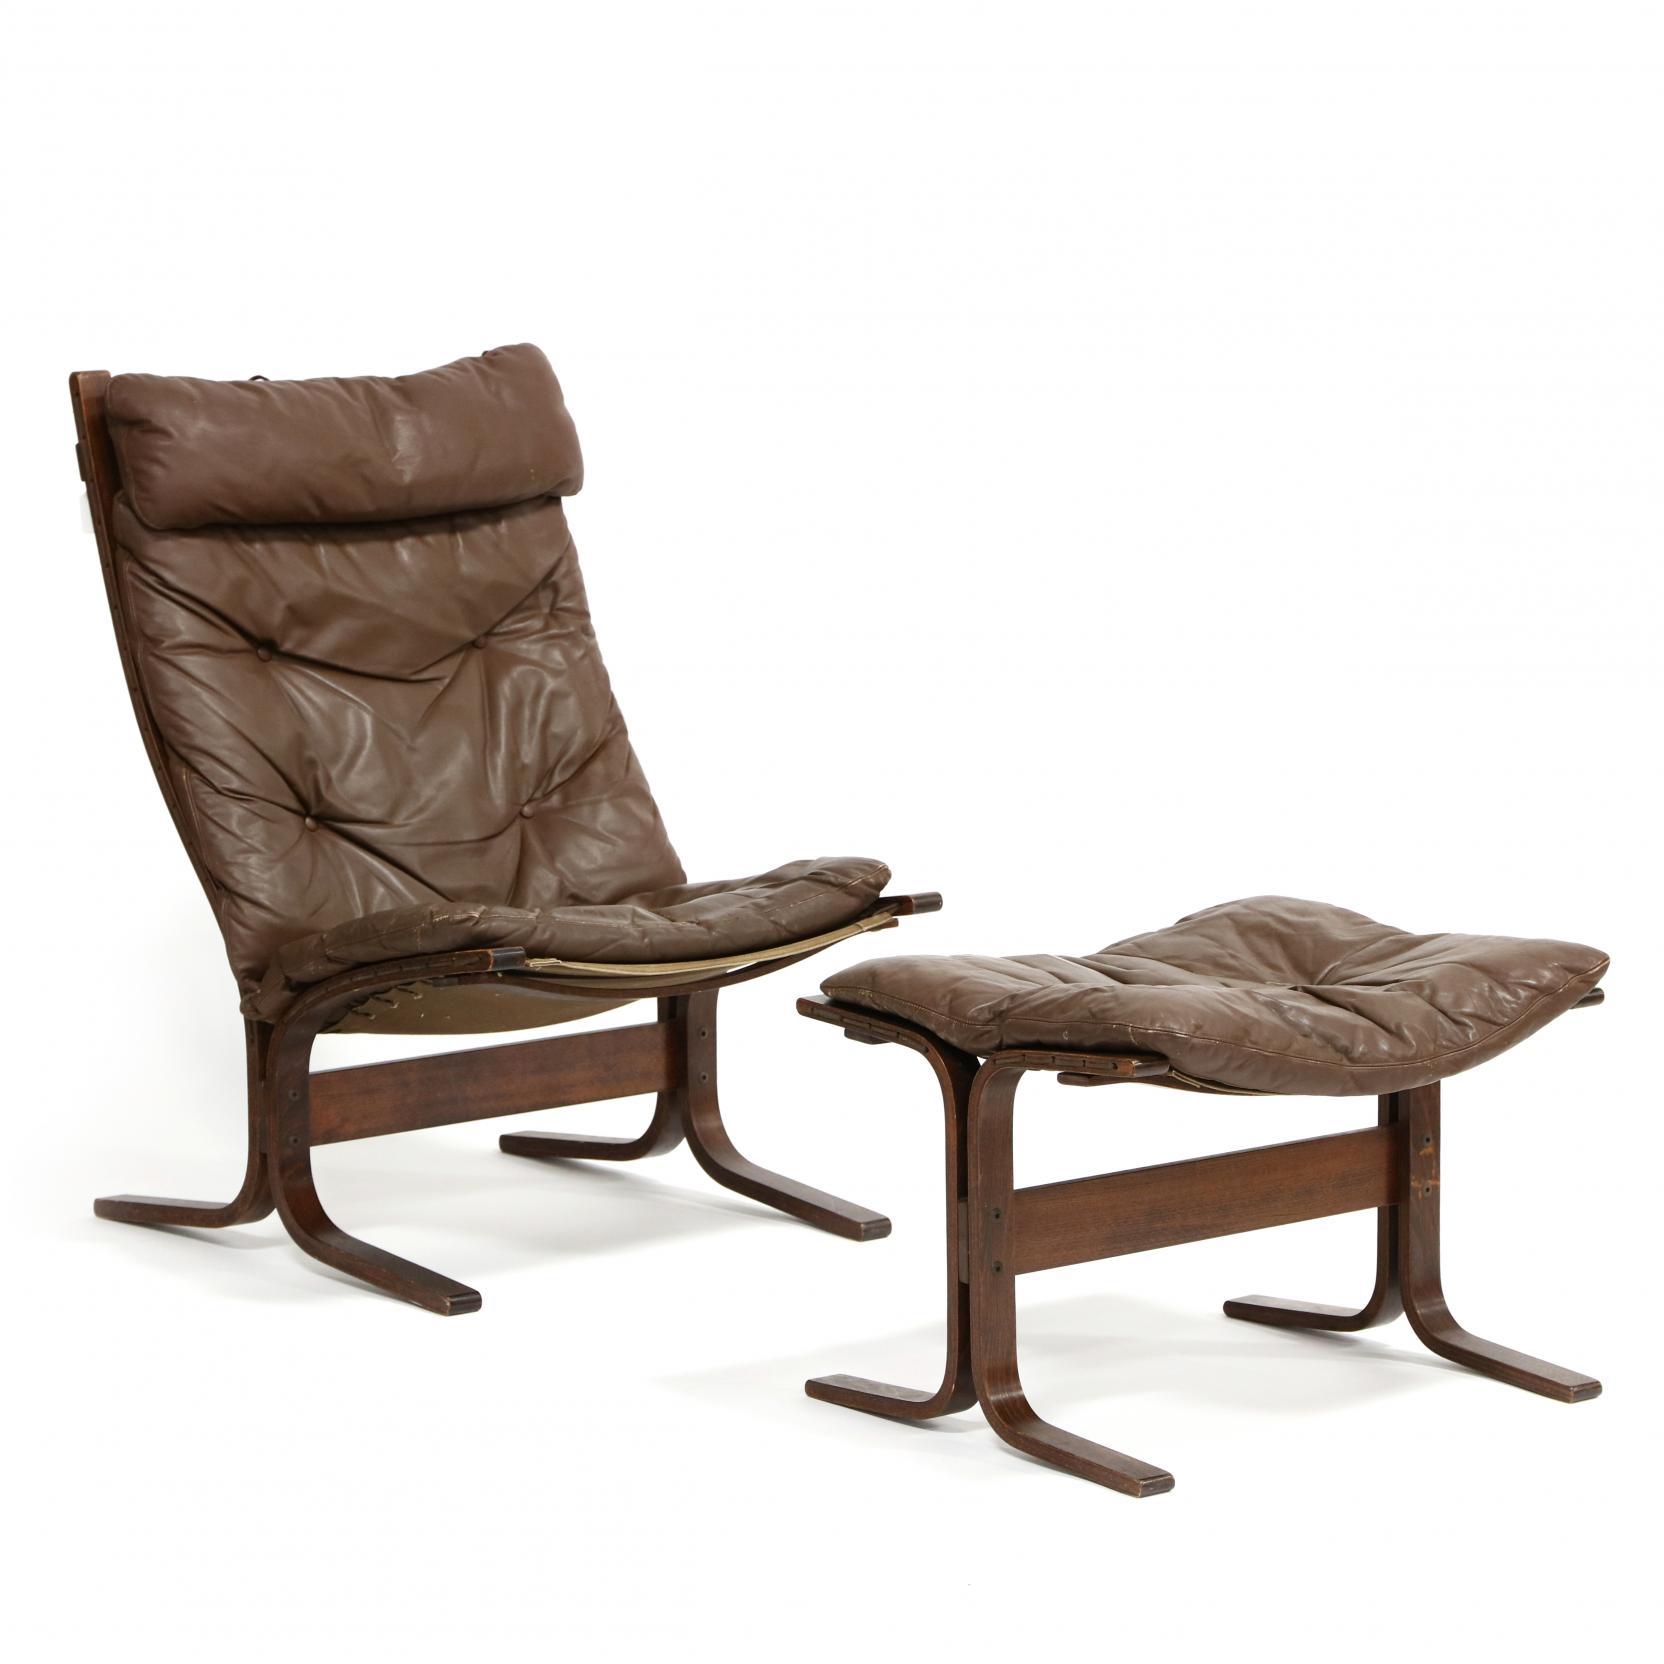 ingmar-relling-siesta-high-back-chair-and-ottoman-westnofa